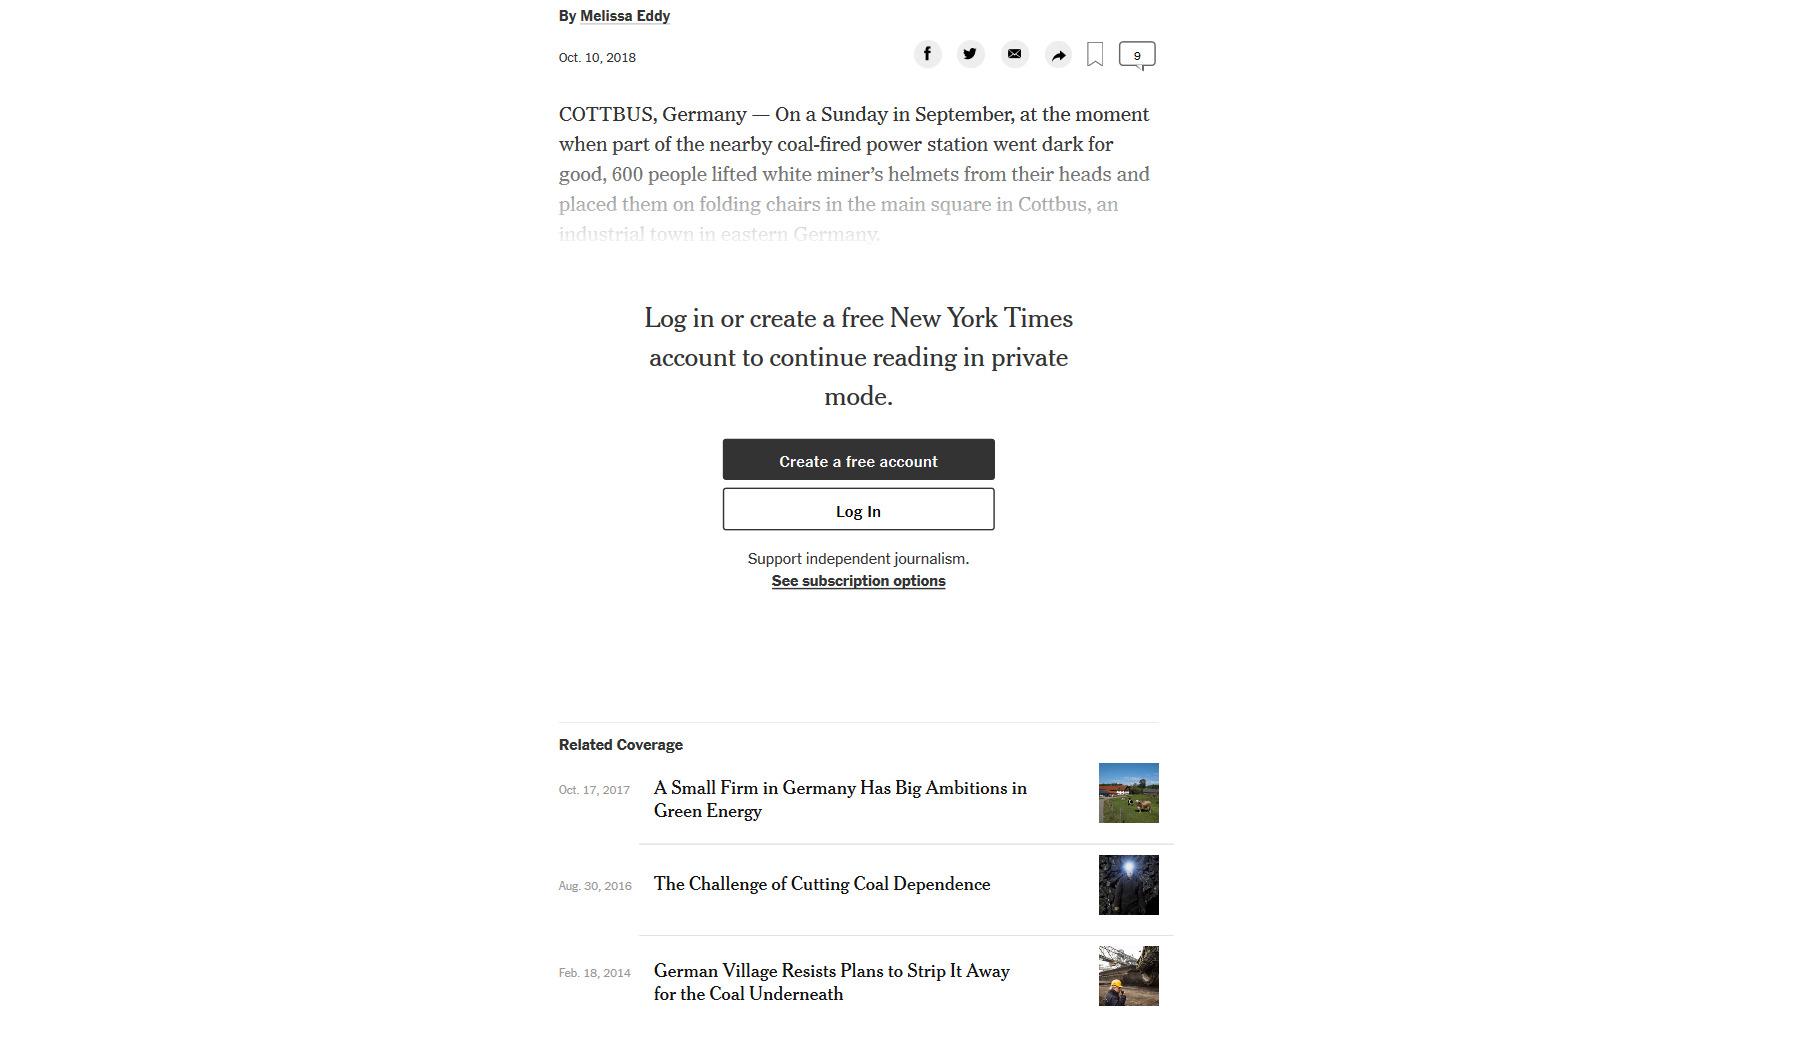 FireShot-Capture-53-Why-'Green'-Ge__-https___www.nytimes.com_2018_10_10